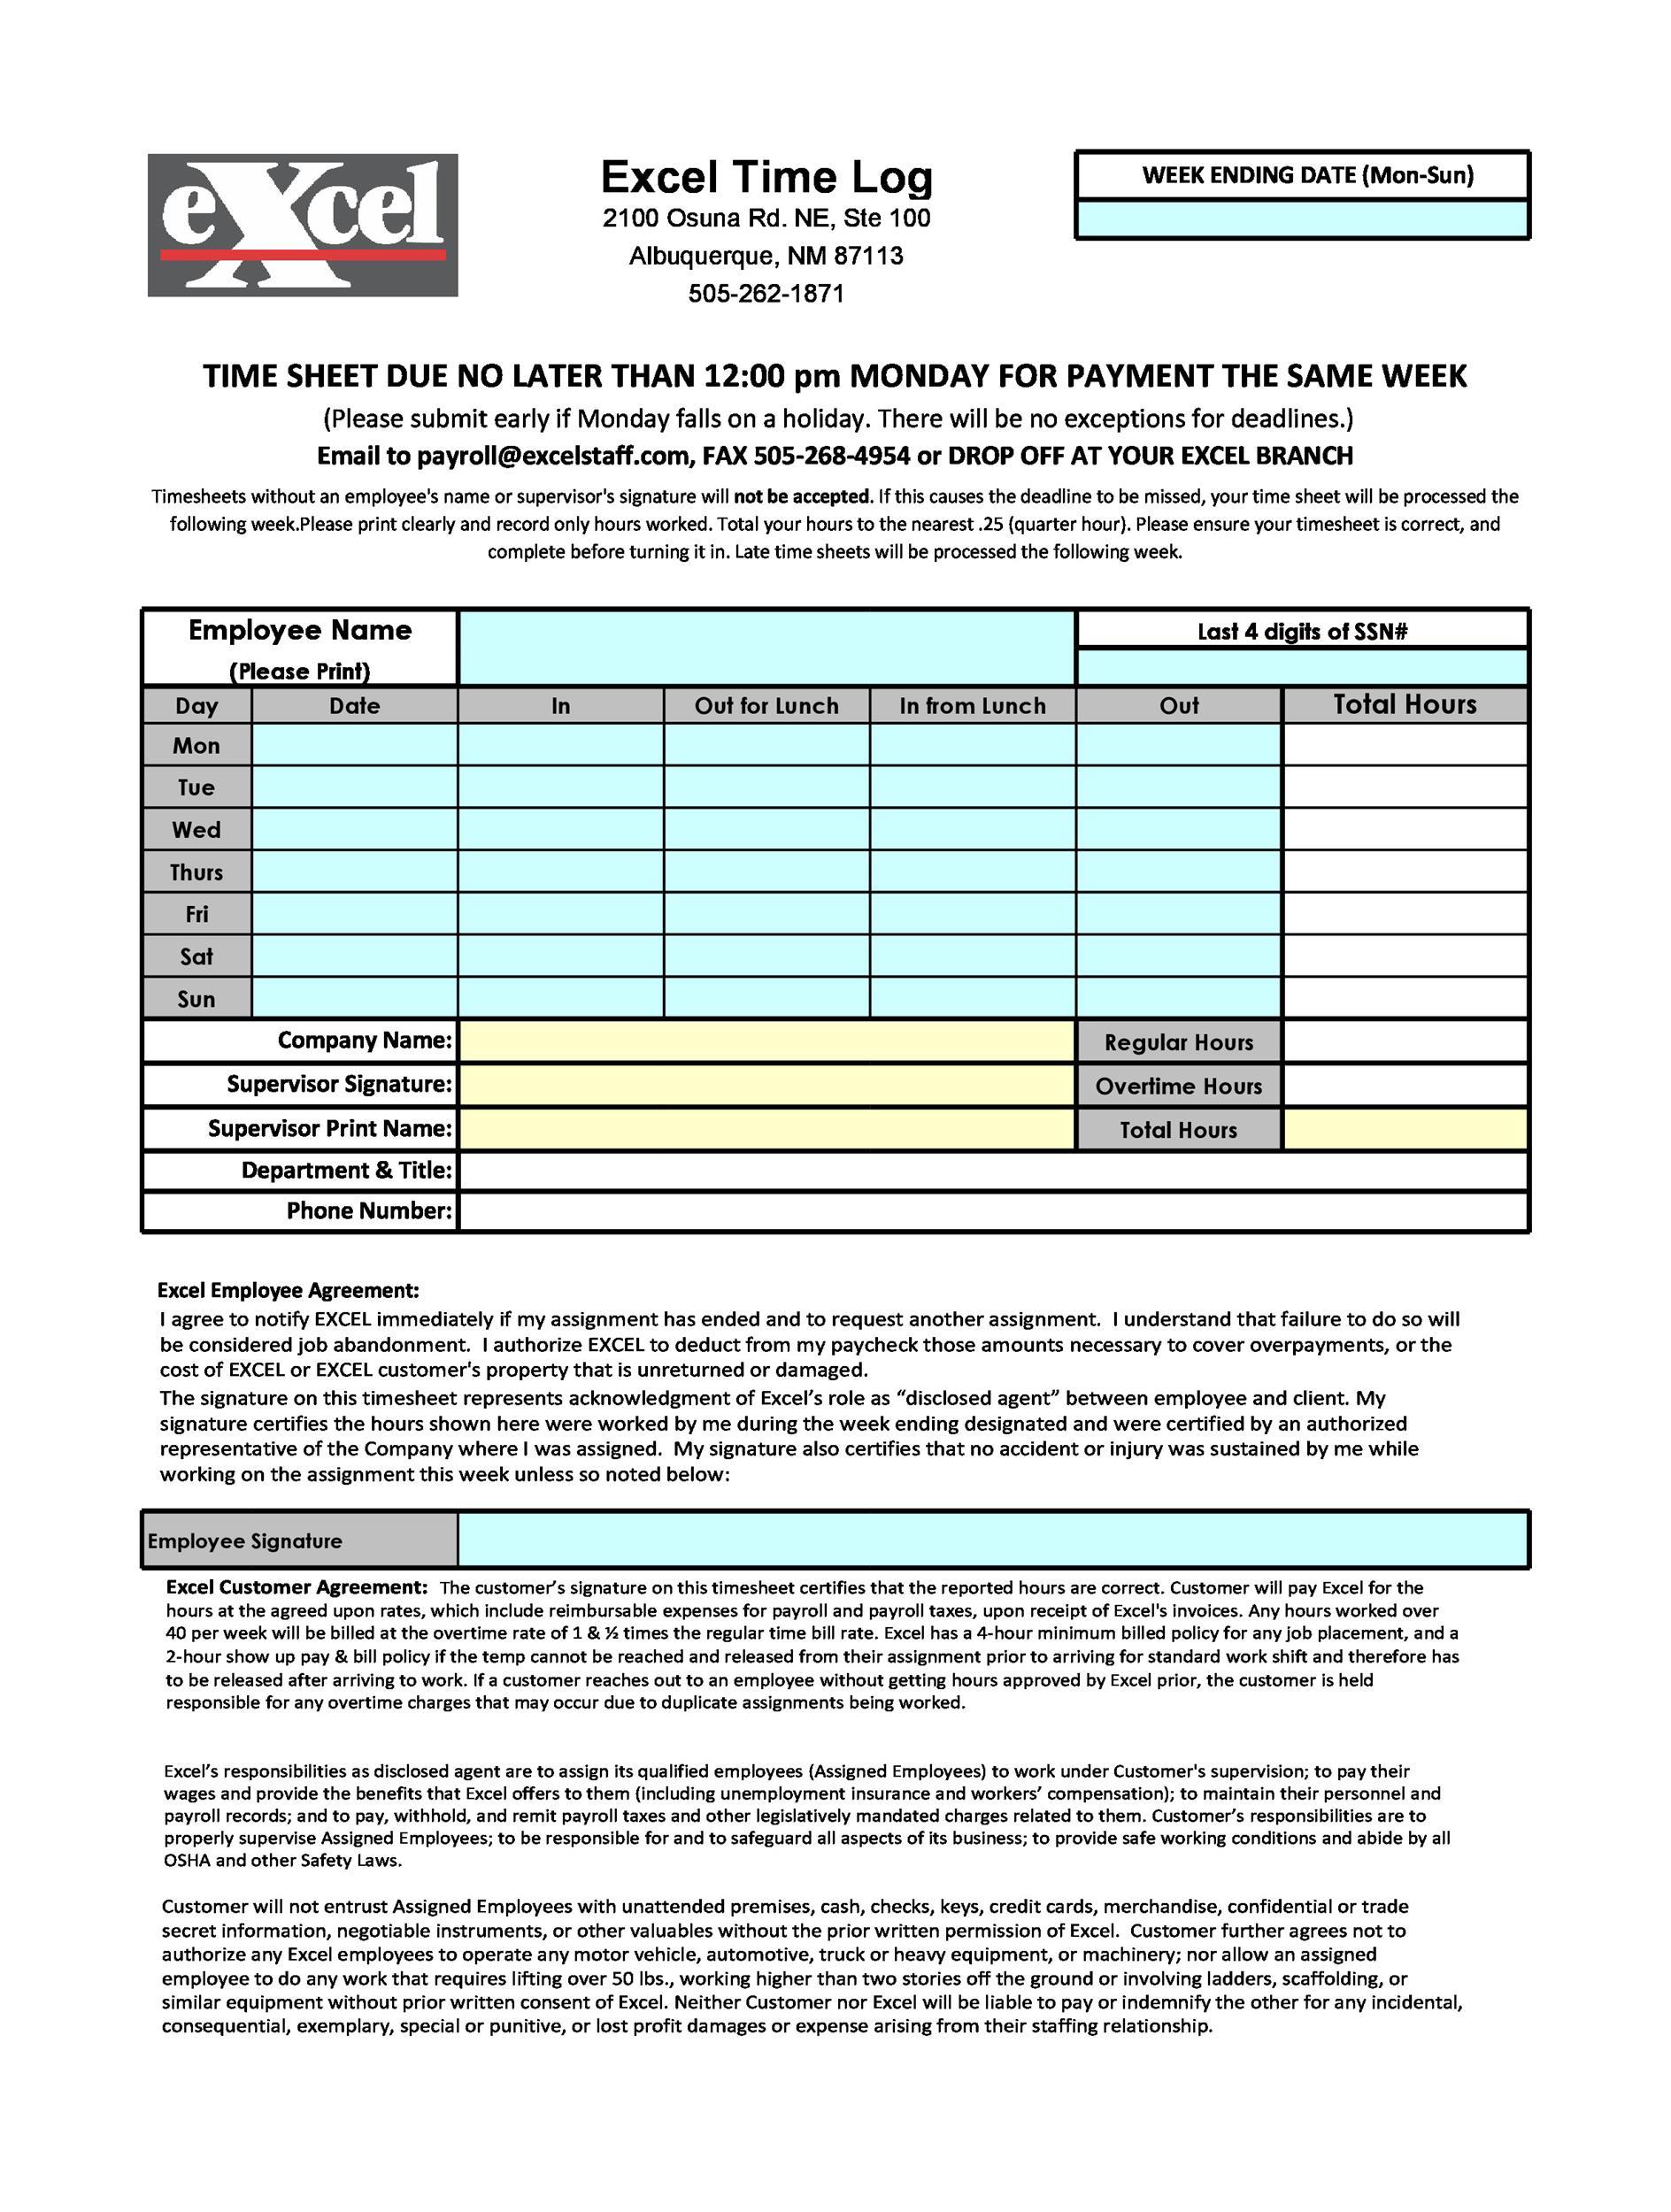 Time Log Spreadsheet